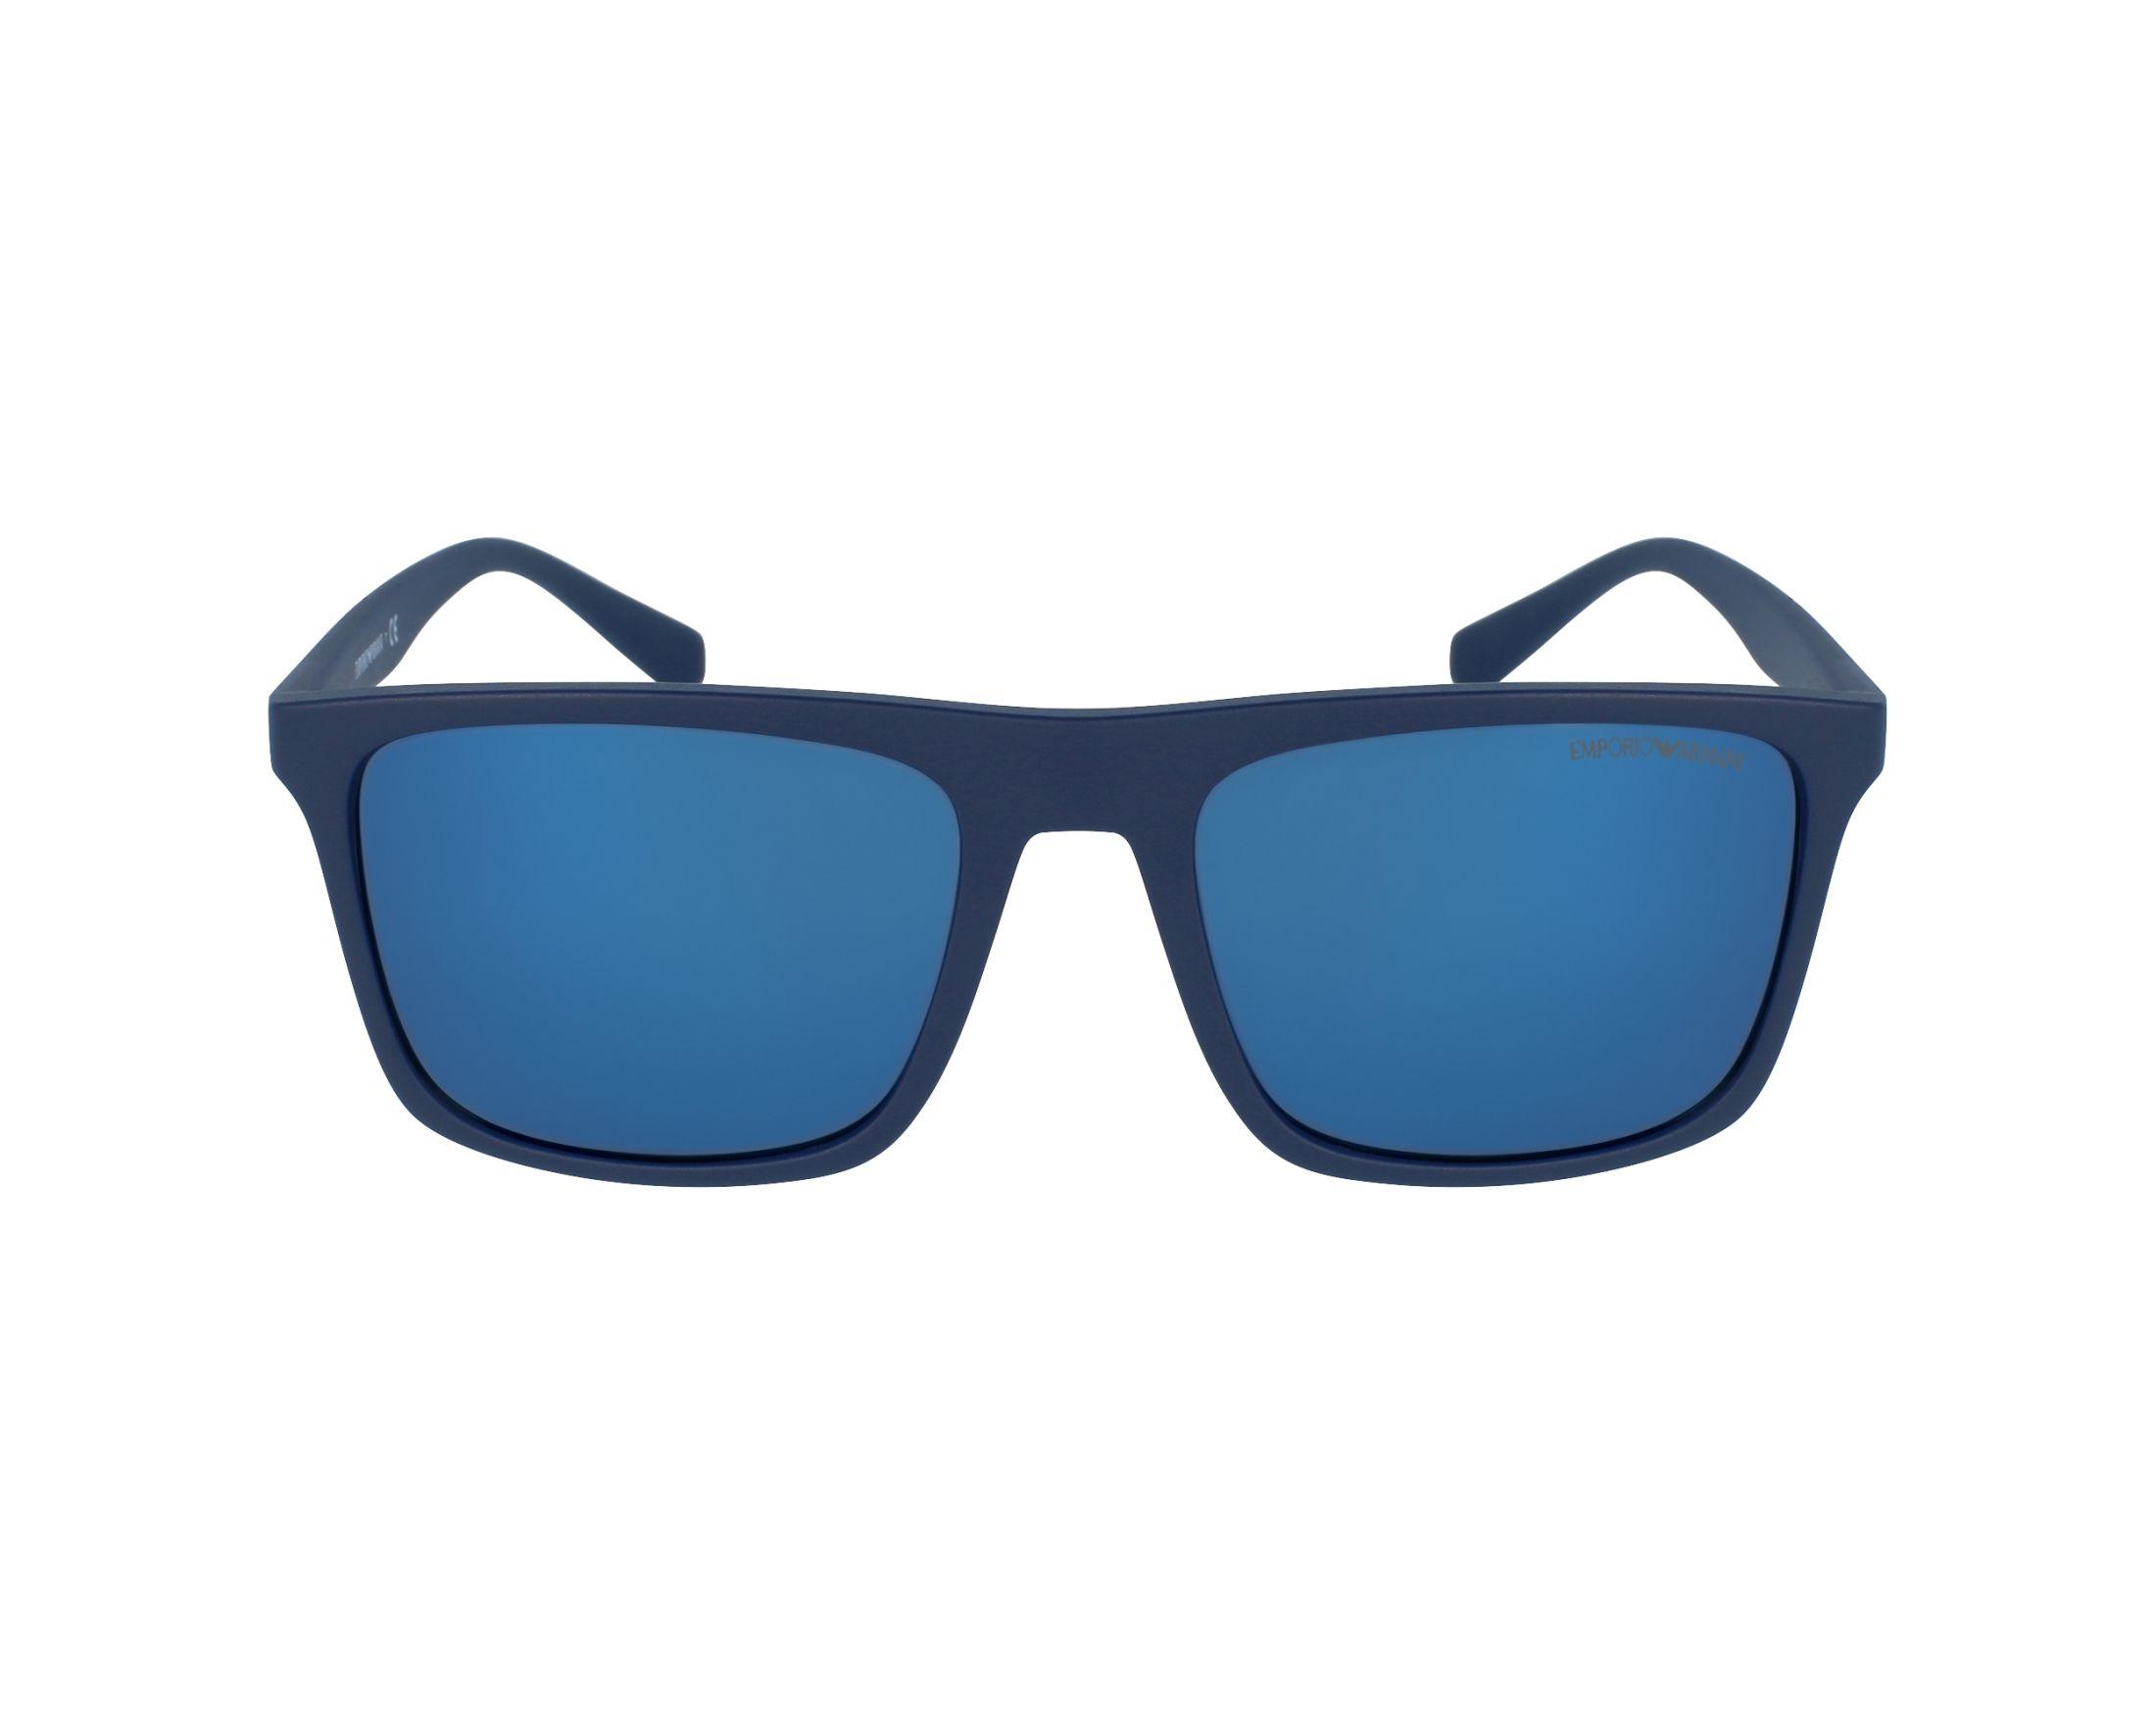 Emporio Armani Sunglasses Blue with Grey Lenses EA-4097 5575/96 ...